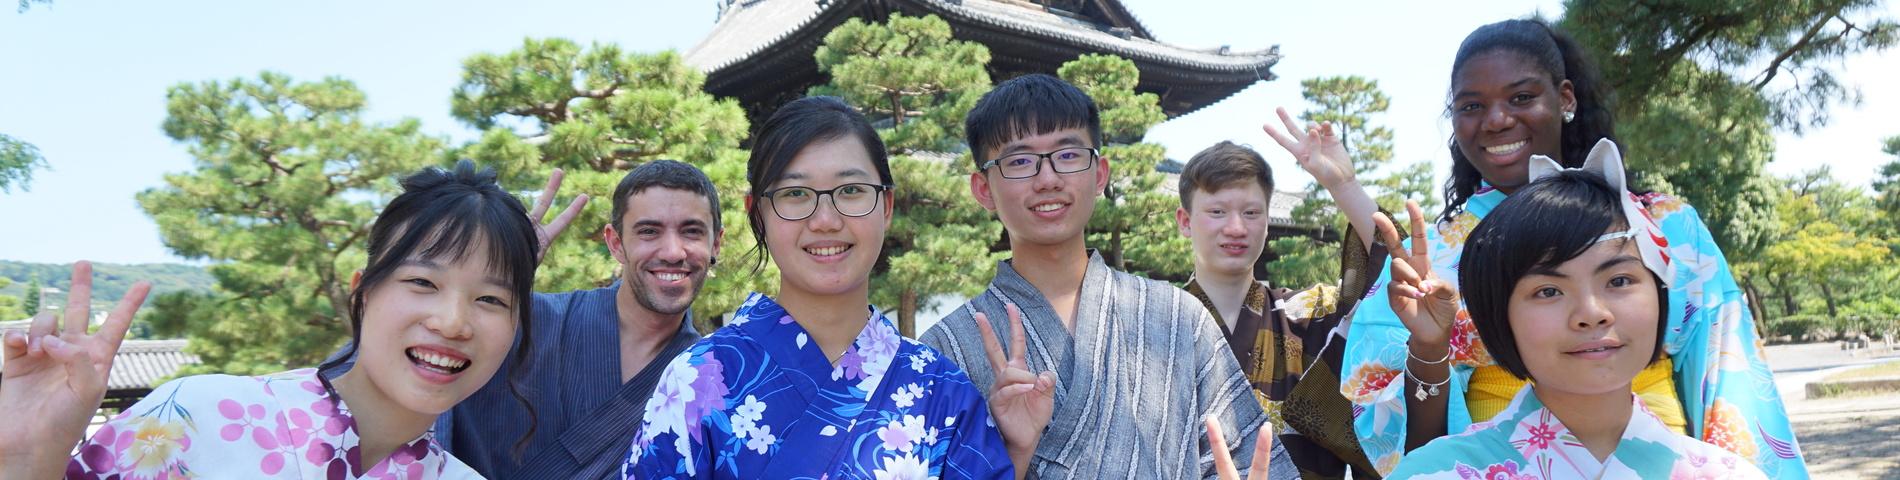 Kyoto JaLS รูปภาพ 1